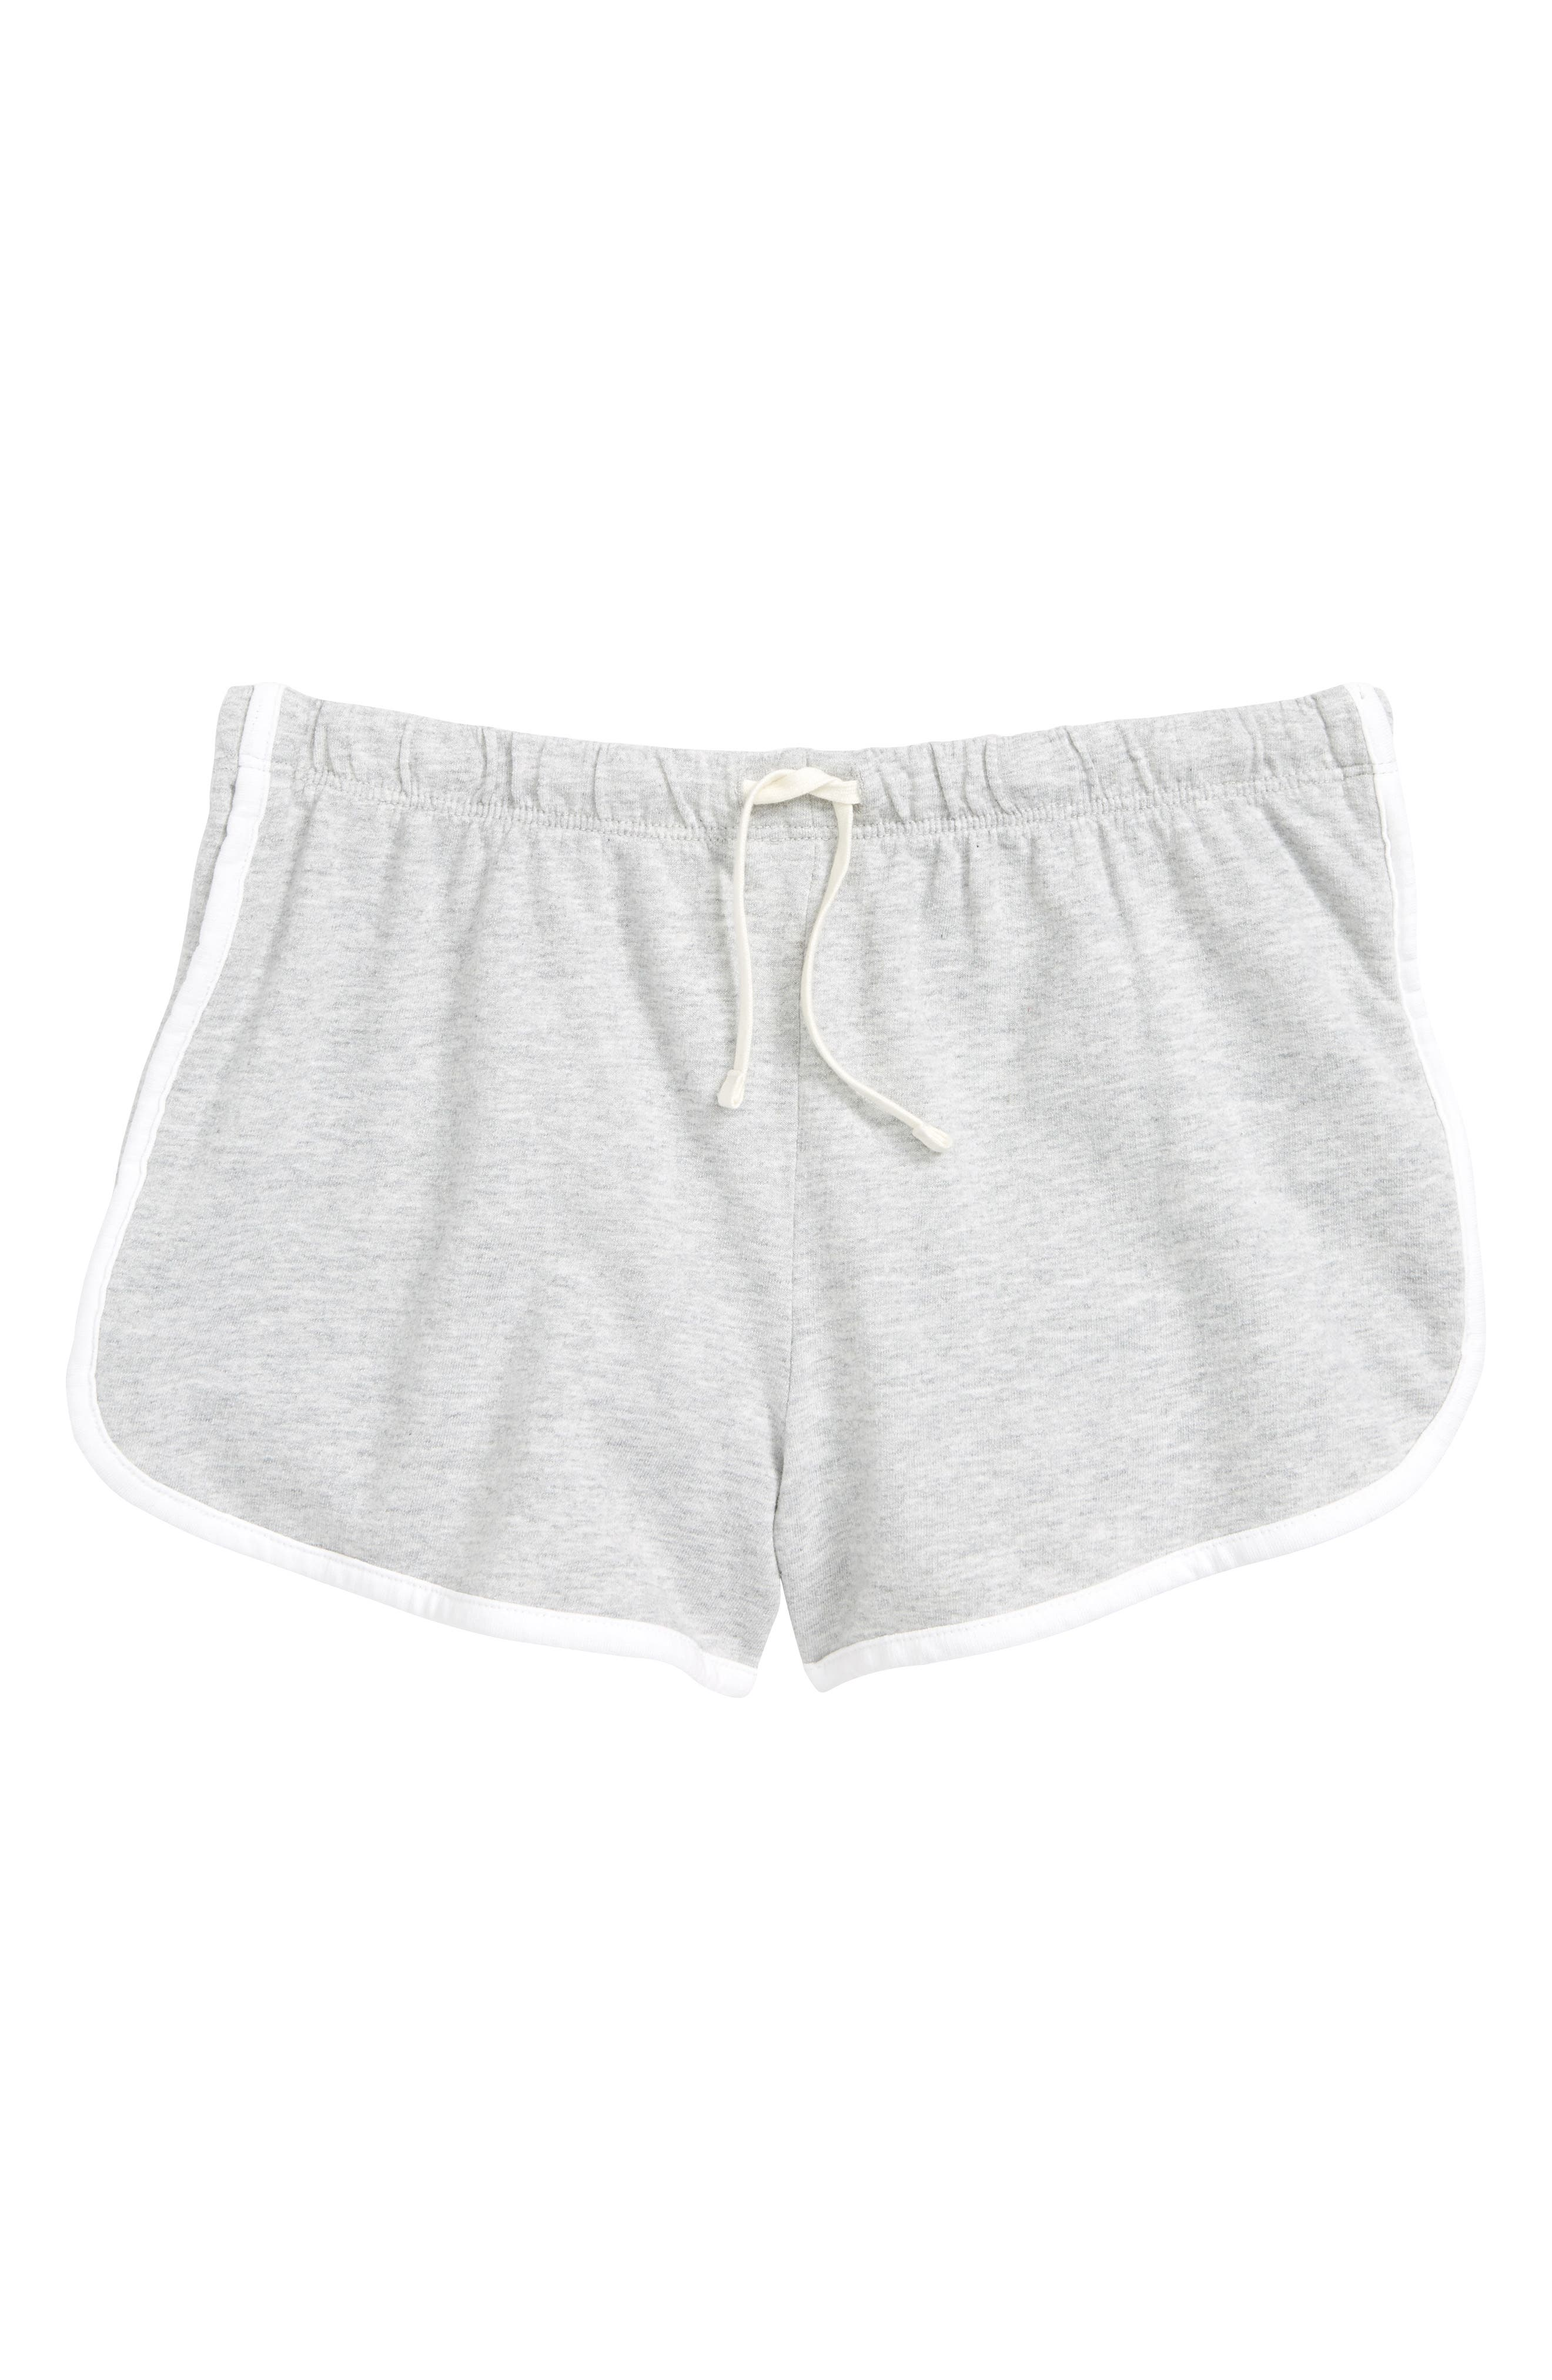 Cotton Dolphin Shorts,                             Main thumbnail 2, color,